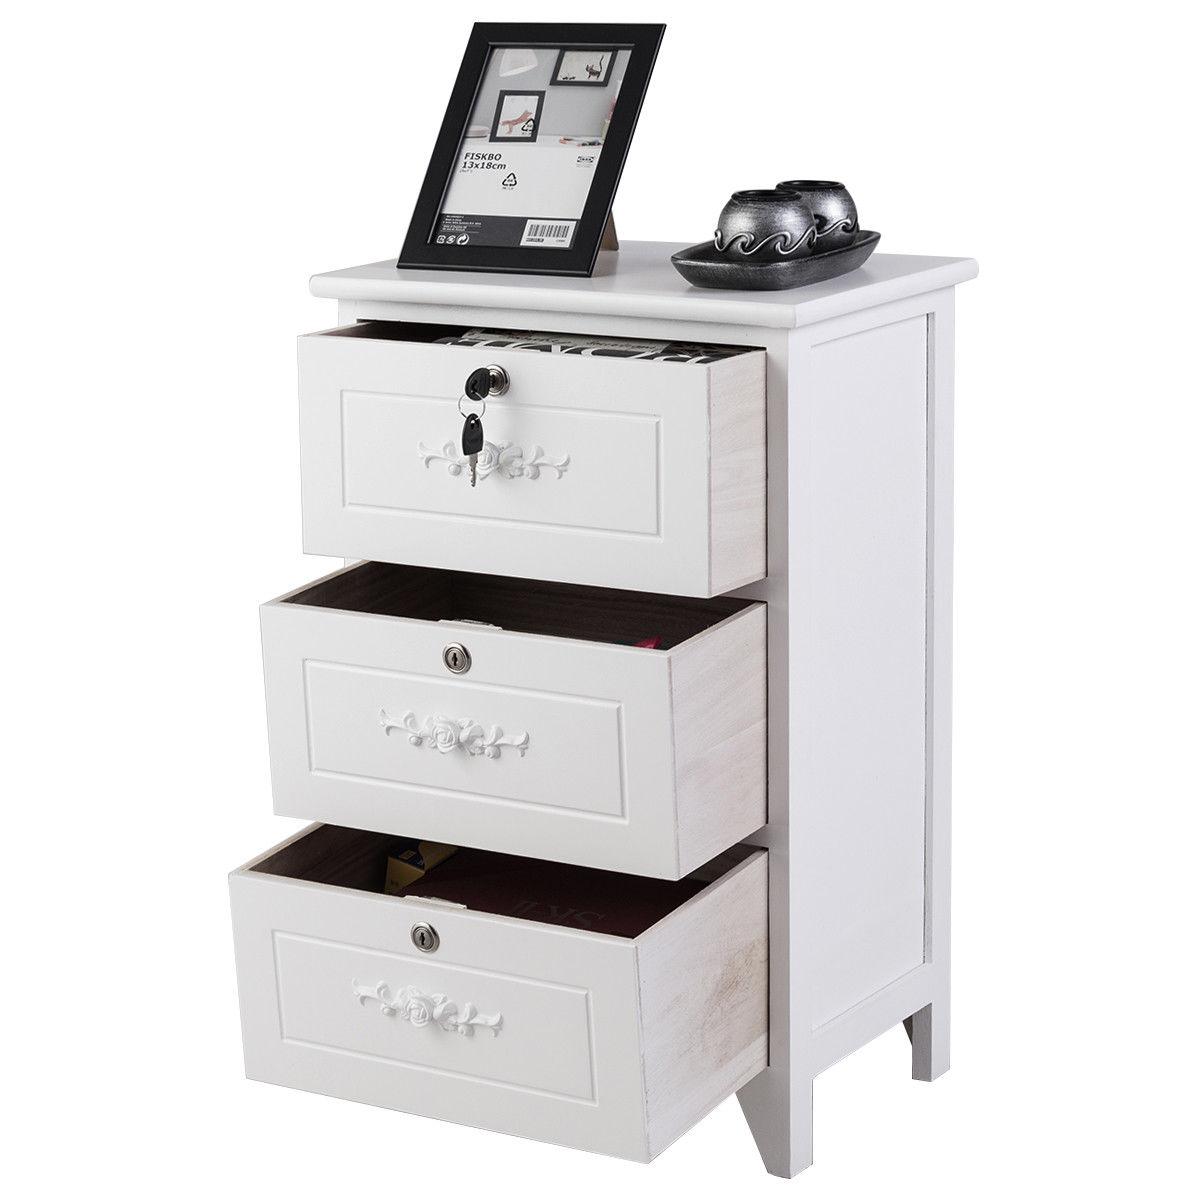 Wood Nightstand Bedroom Table Three Drawer Storage Organizer Bedside Tables Bedroom Furniture